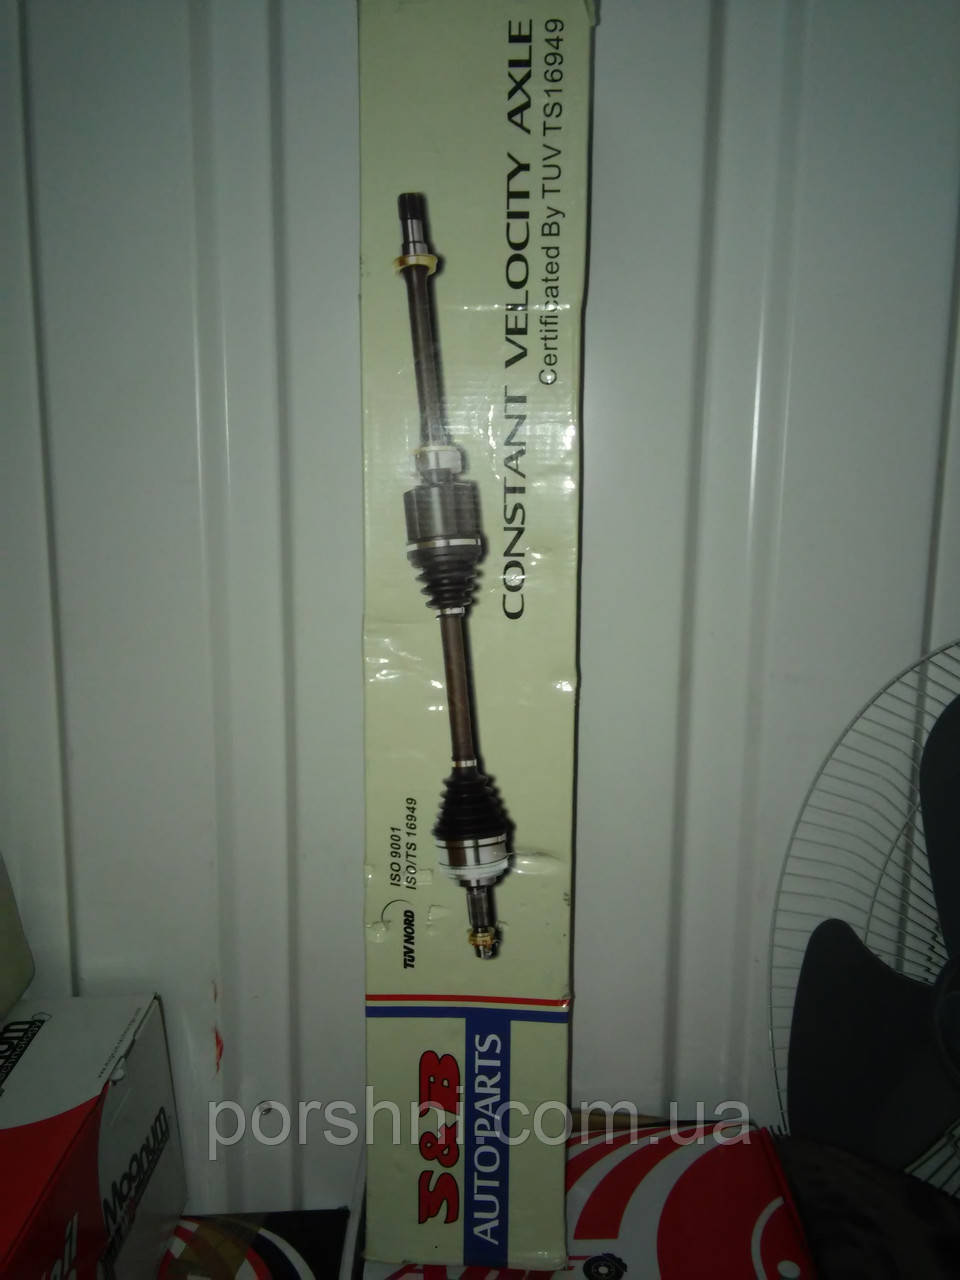 Полуось Ford CONNECT  2002 --  LH   KDD  2T143B437FB